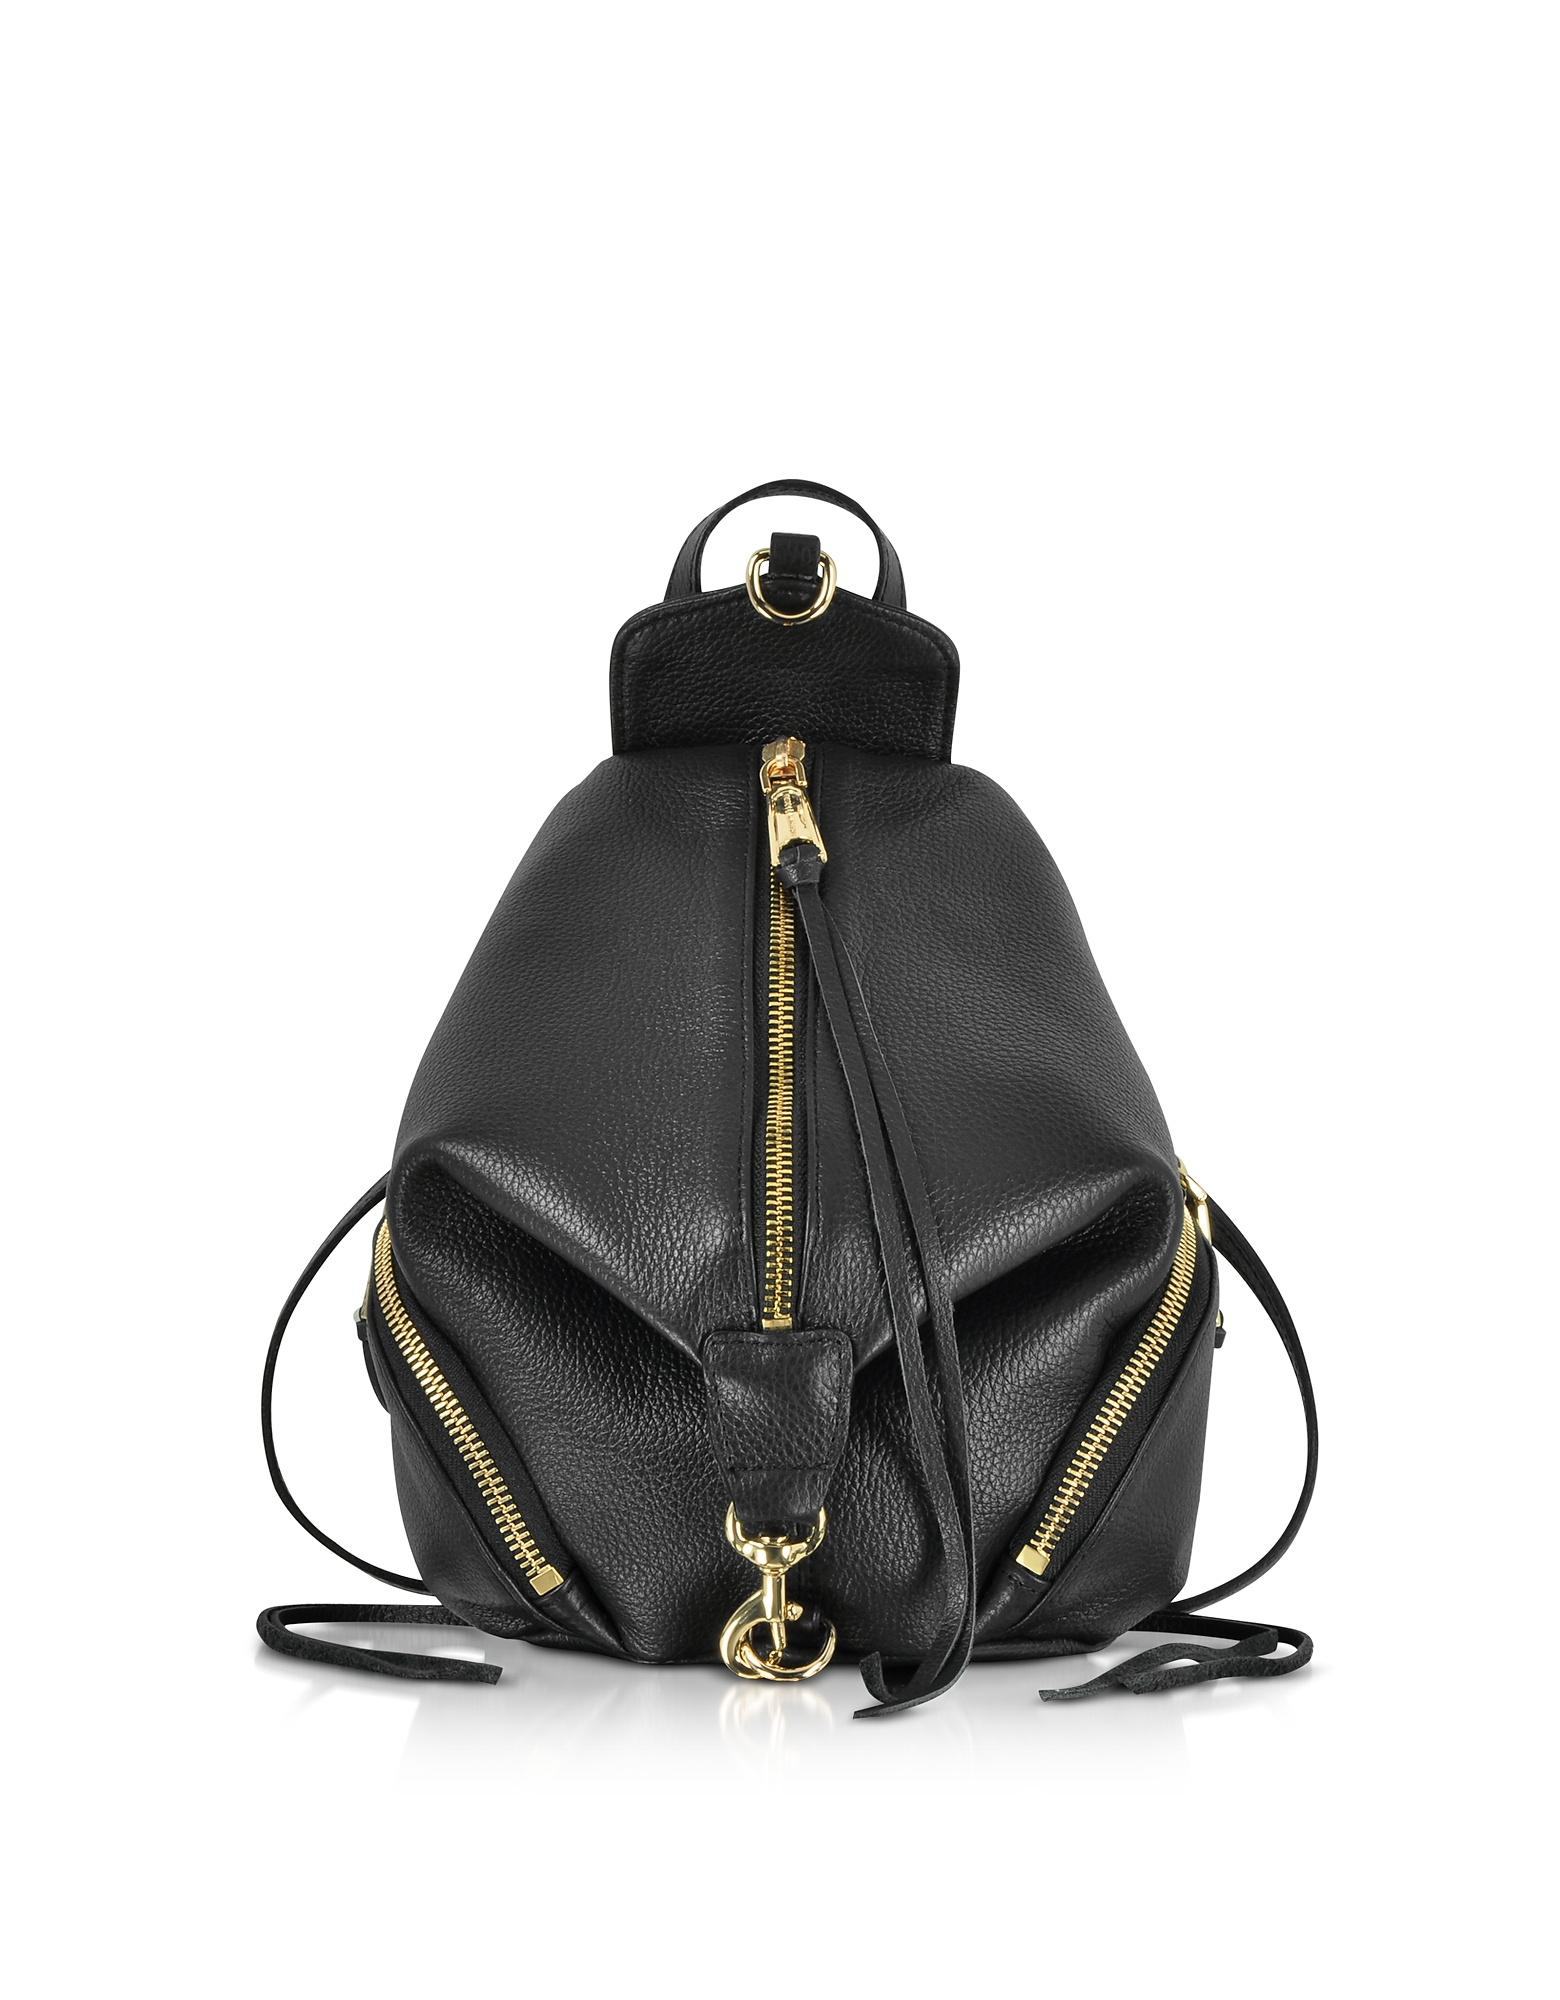 Image of Rebecca Minkoff Designer Handbags, Black Leather Convertible Mini Julian Backpack